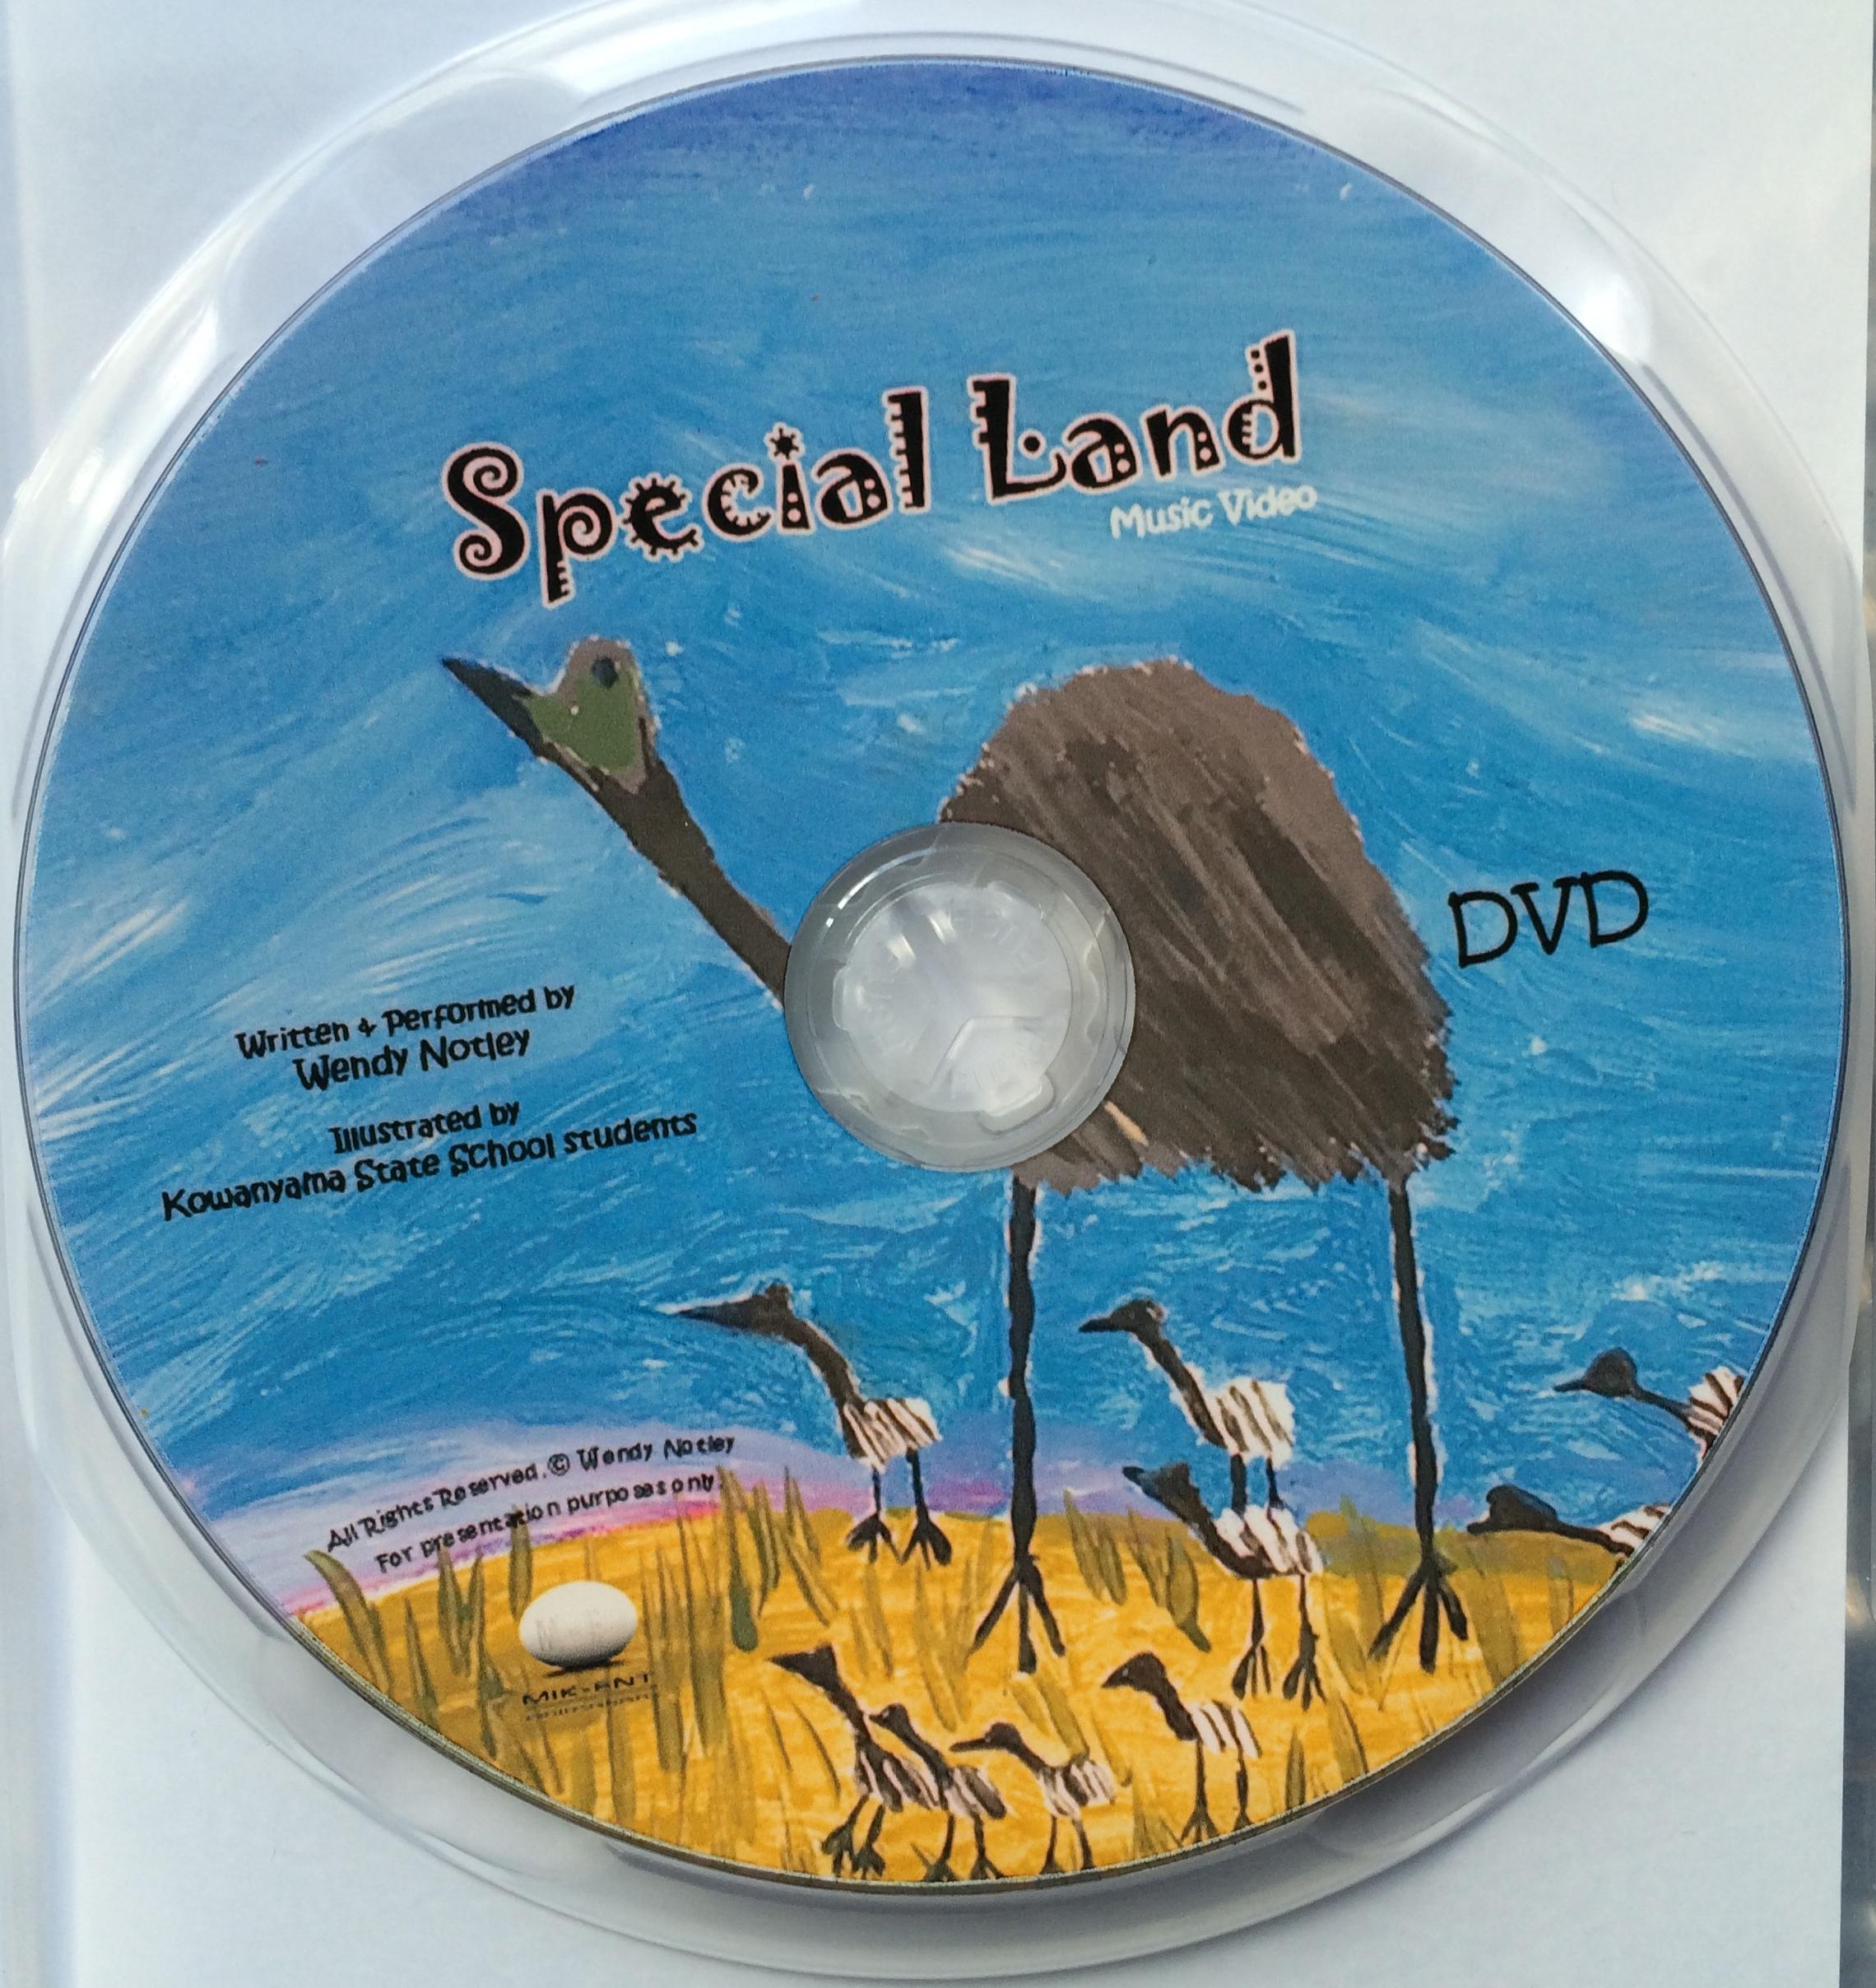 1.special land-animation.jpg